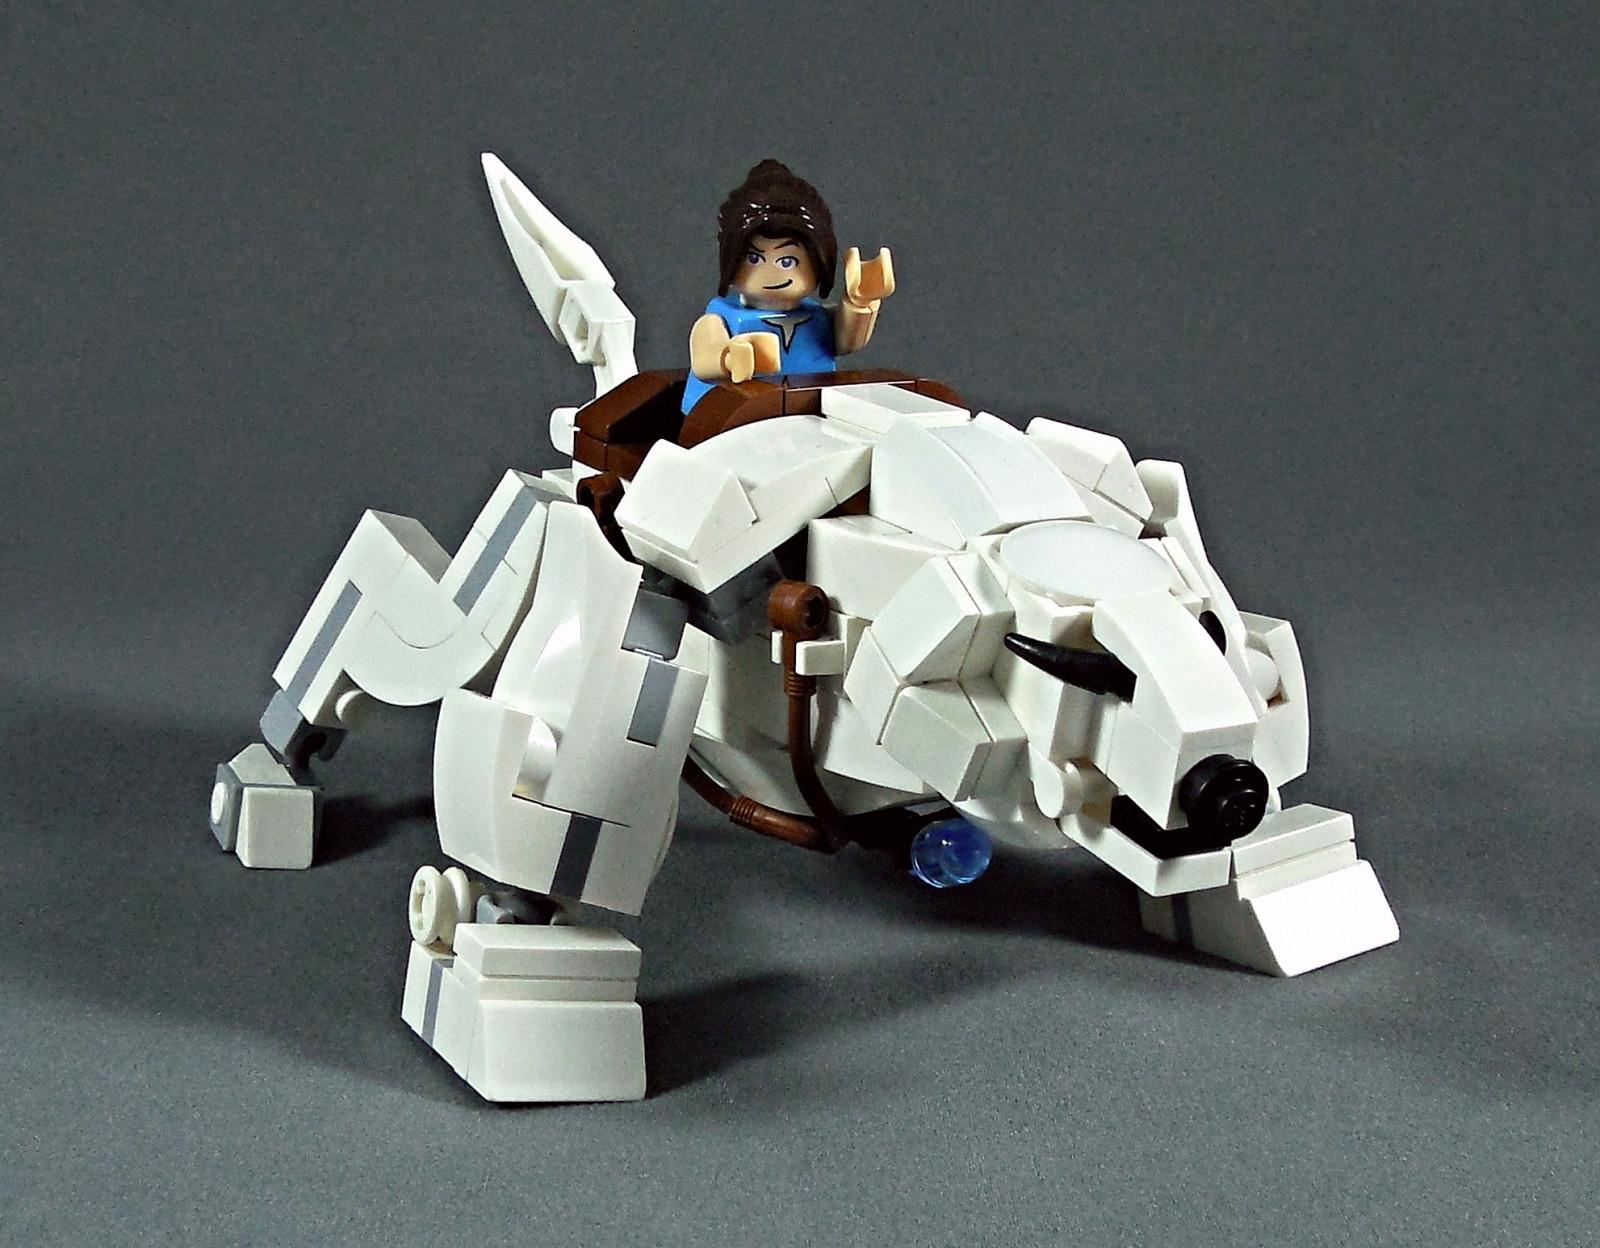 Sfondi robot spazio cartone animato lego cane tecnologia